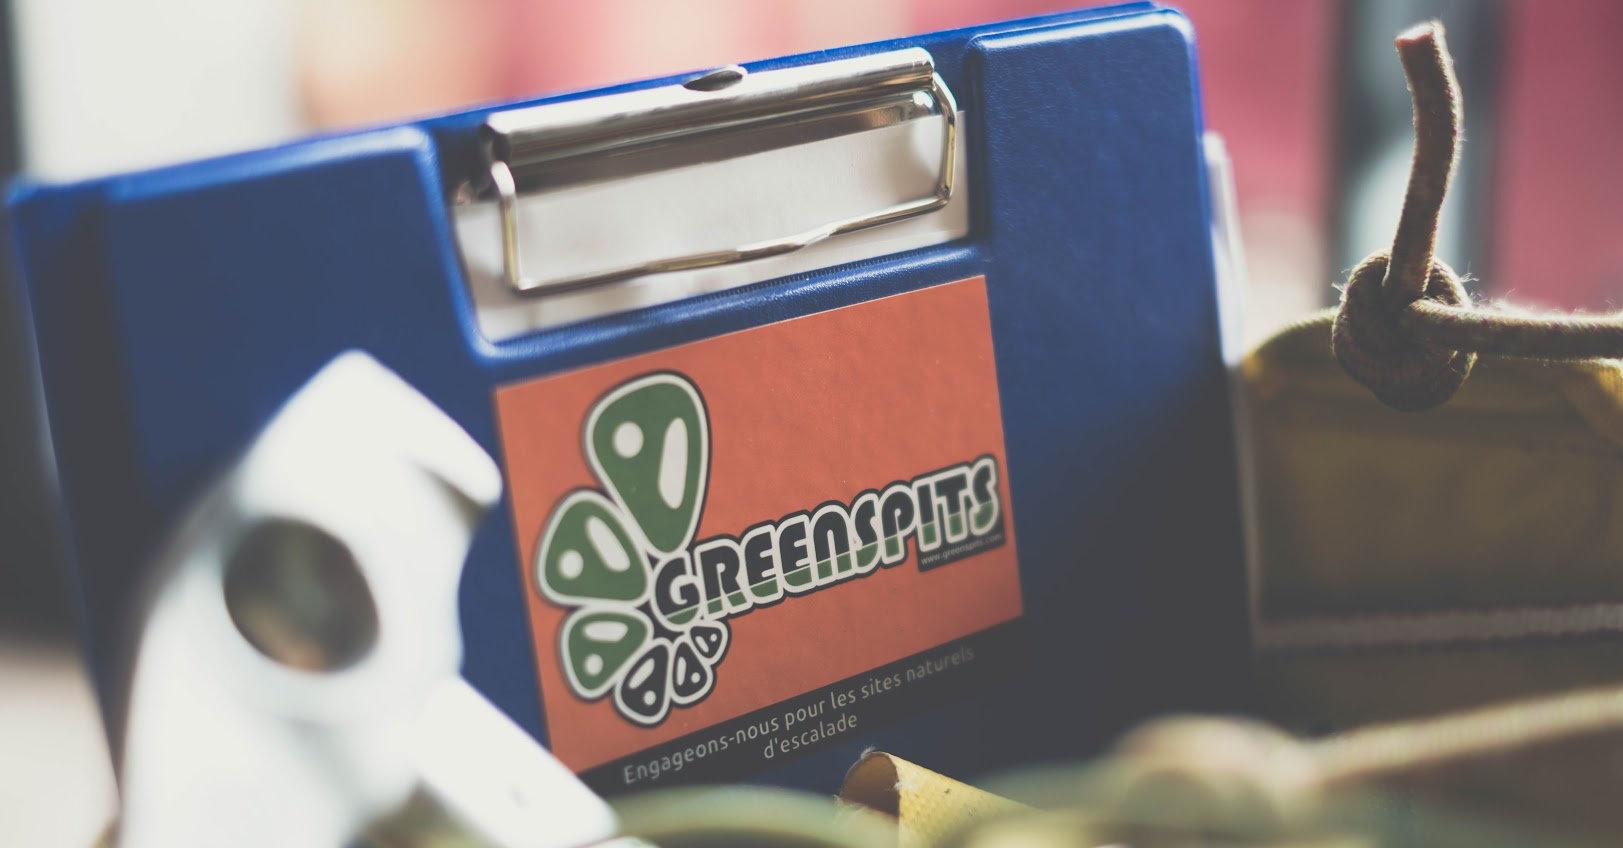 Assemblée générale Greenspits